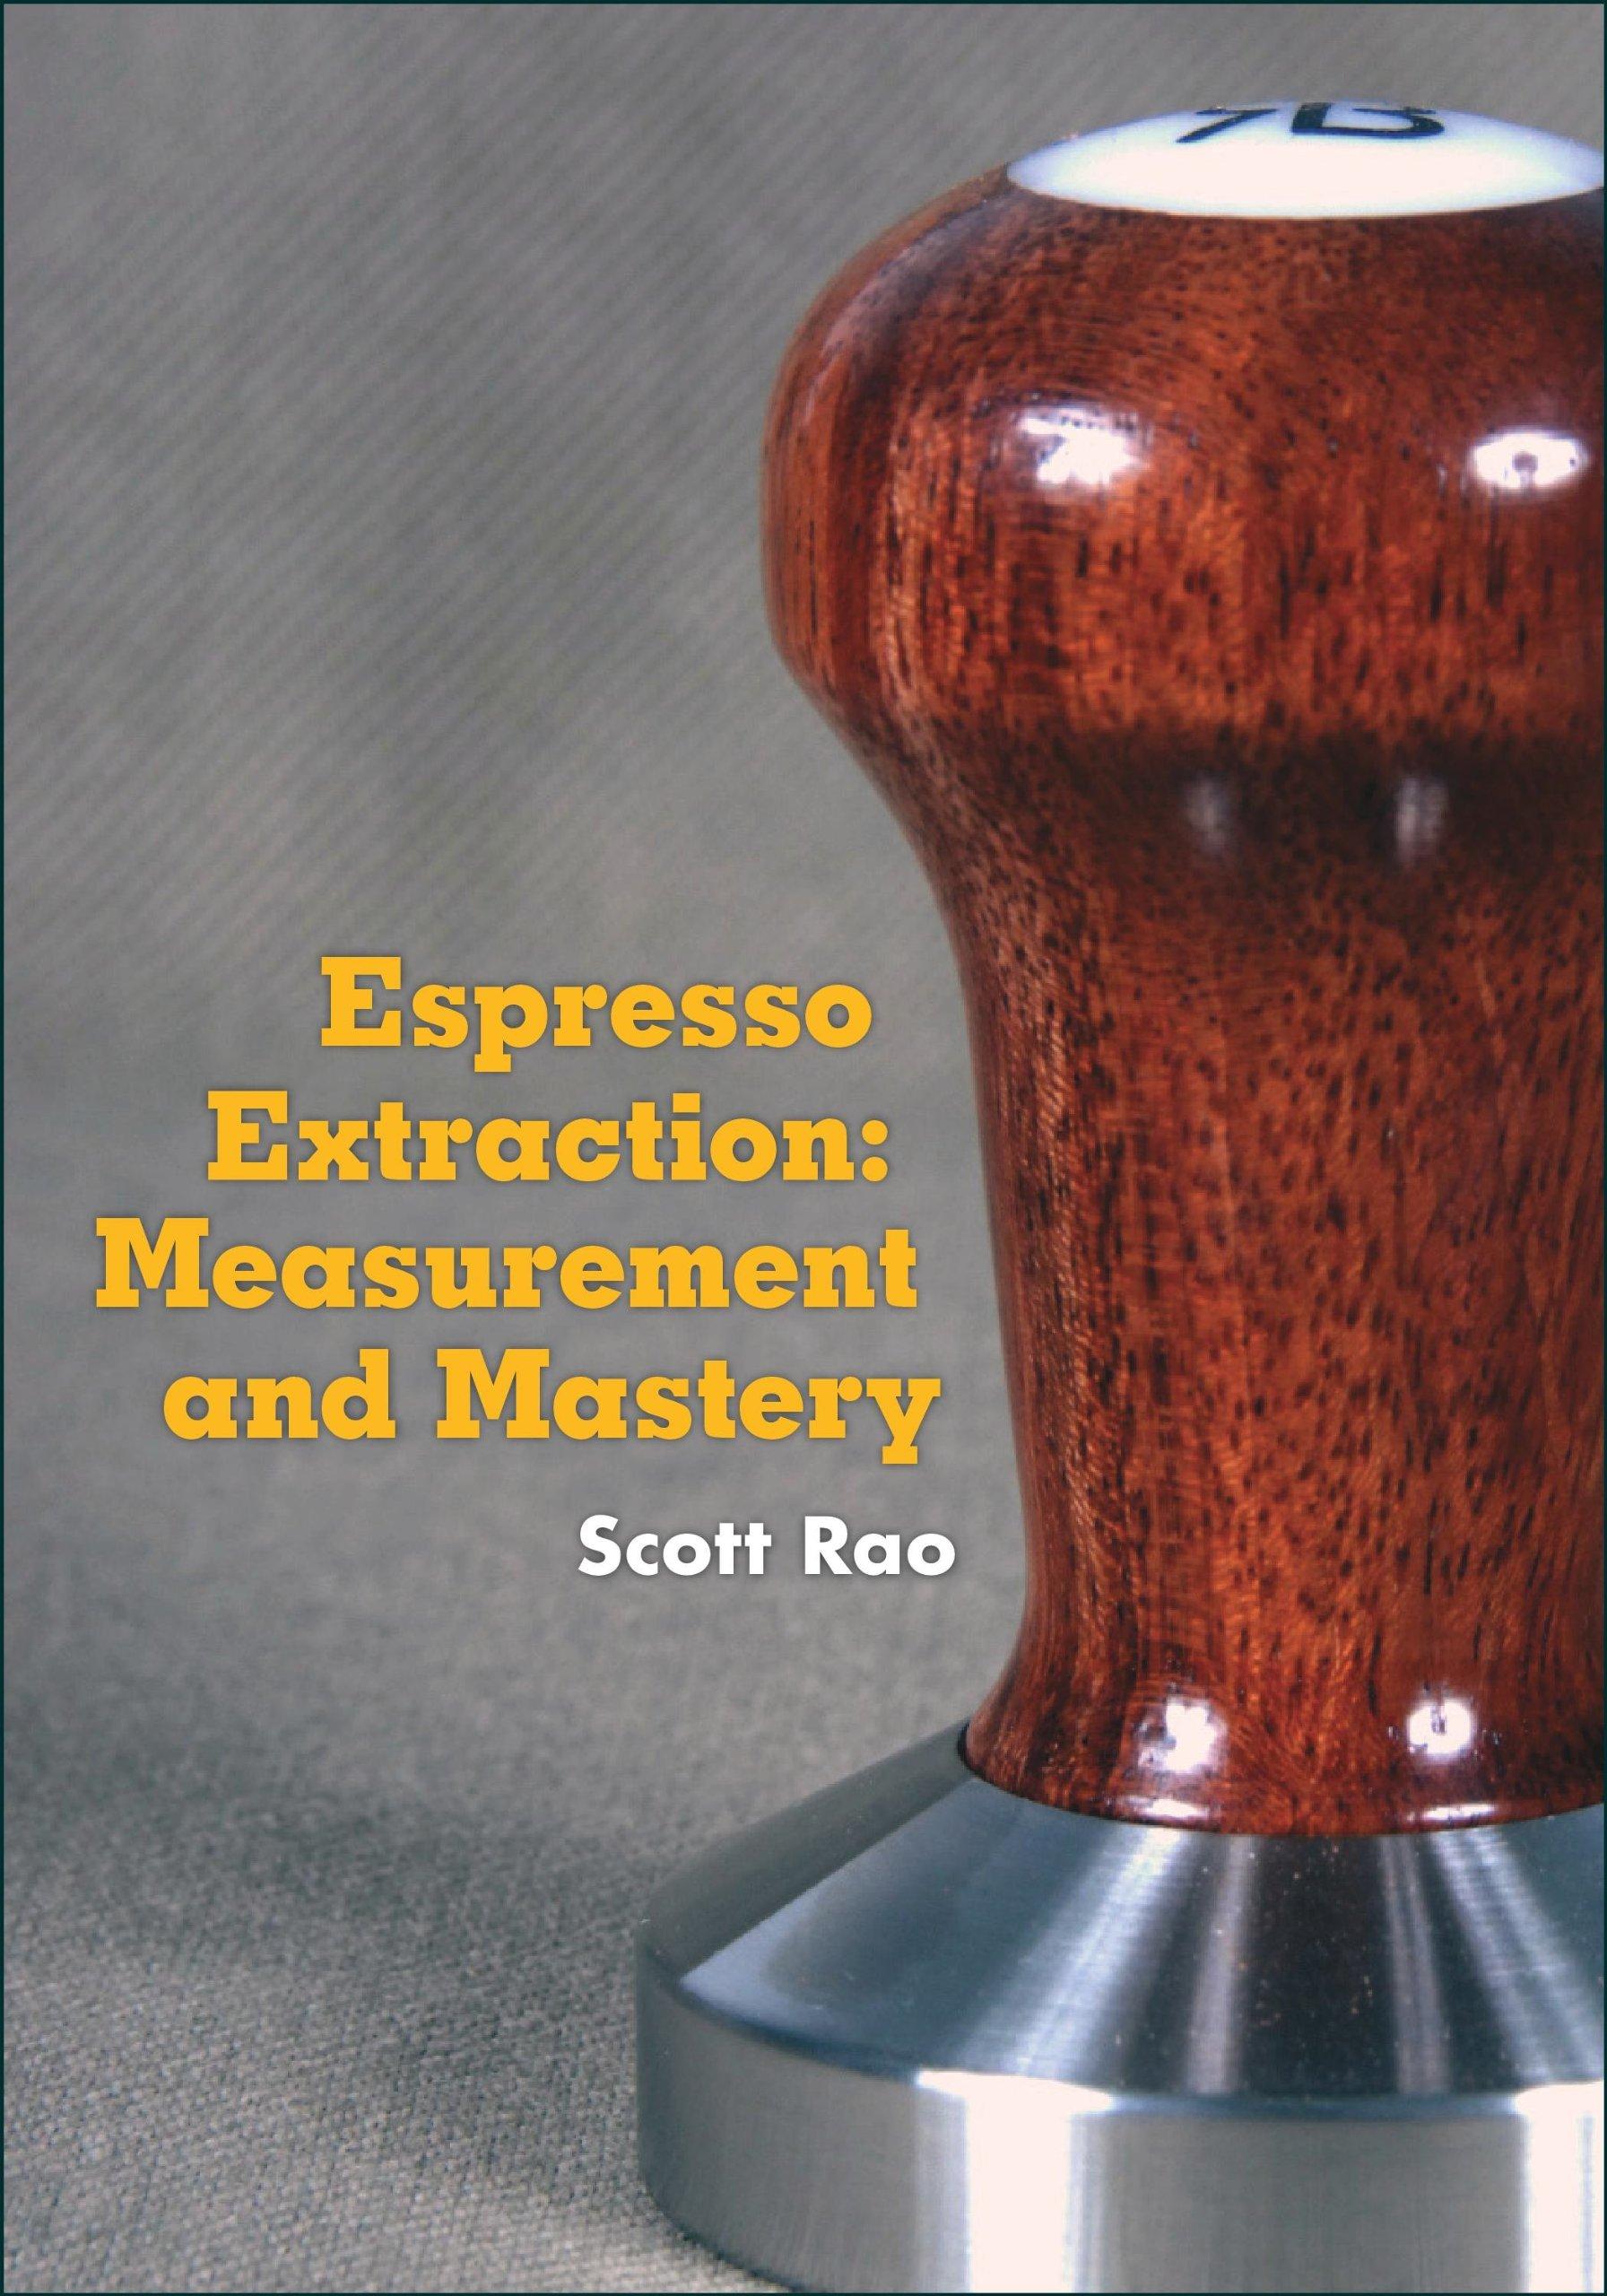 Espresso Extraction Measurement Scott Rao ebook